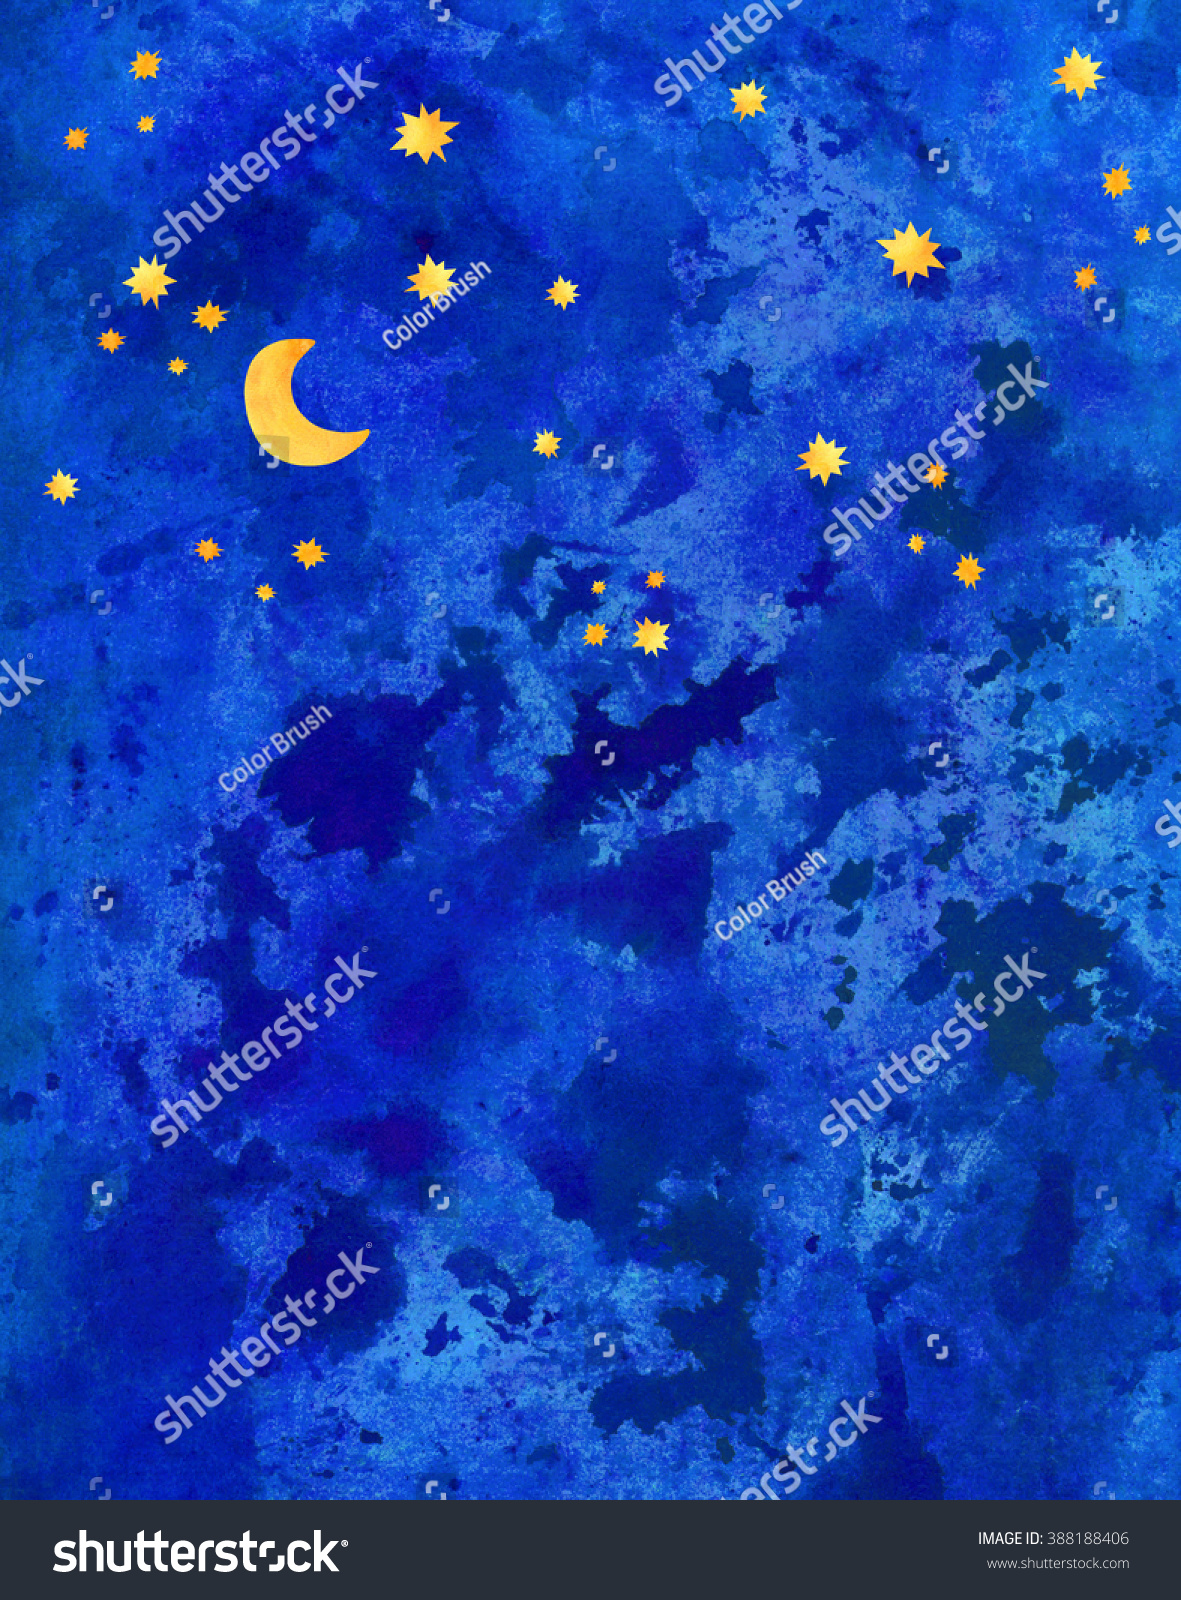 watercolor blue dark night sky background stock illustration 388188406 shutterstock. Black Bedroom Furniture Sets. Home Design Ideas